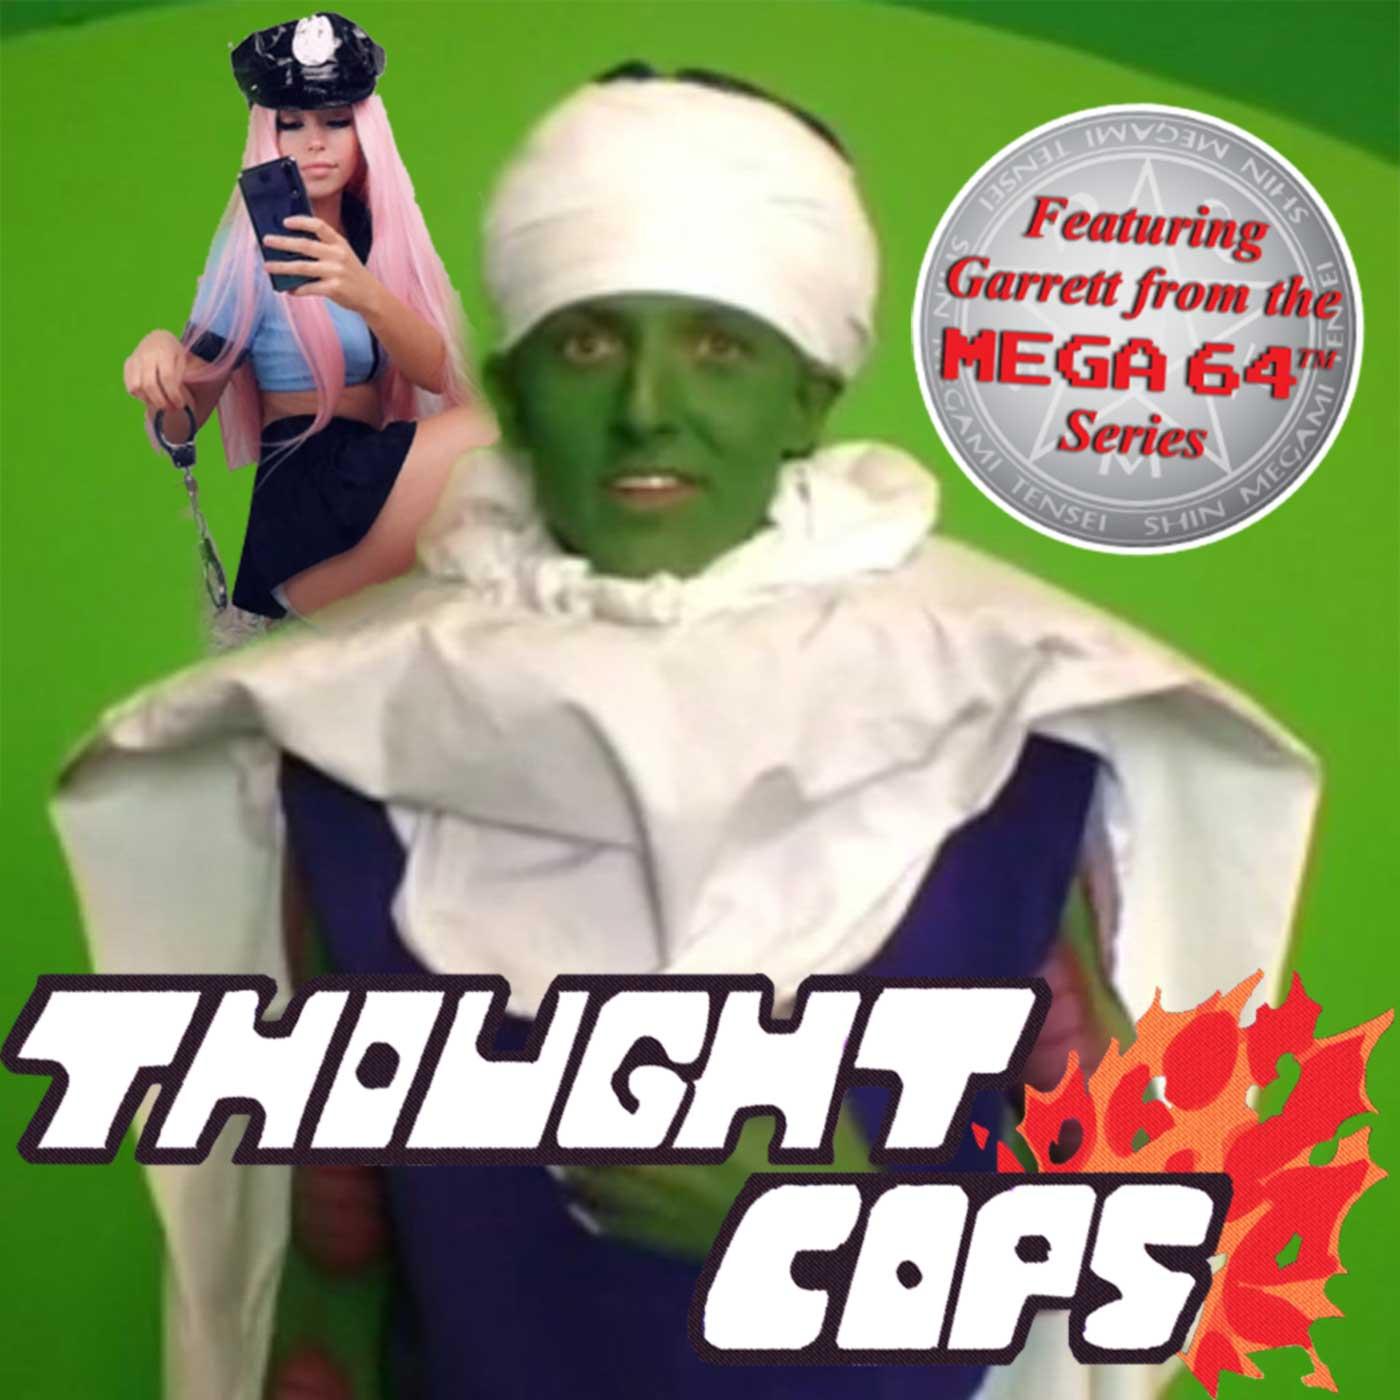 135-thought-cops-mega-64-garrett-hunter-belle-delphine-girlfriend